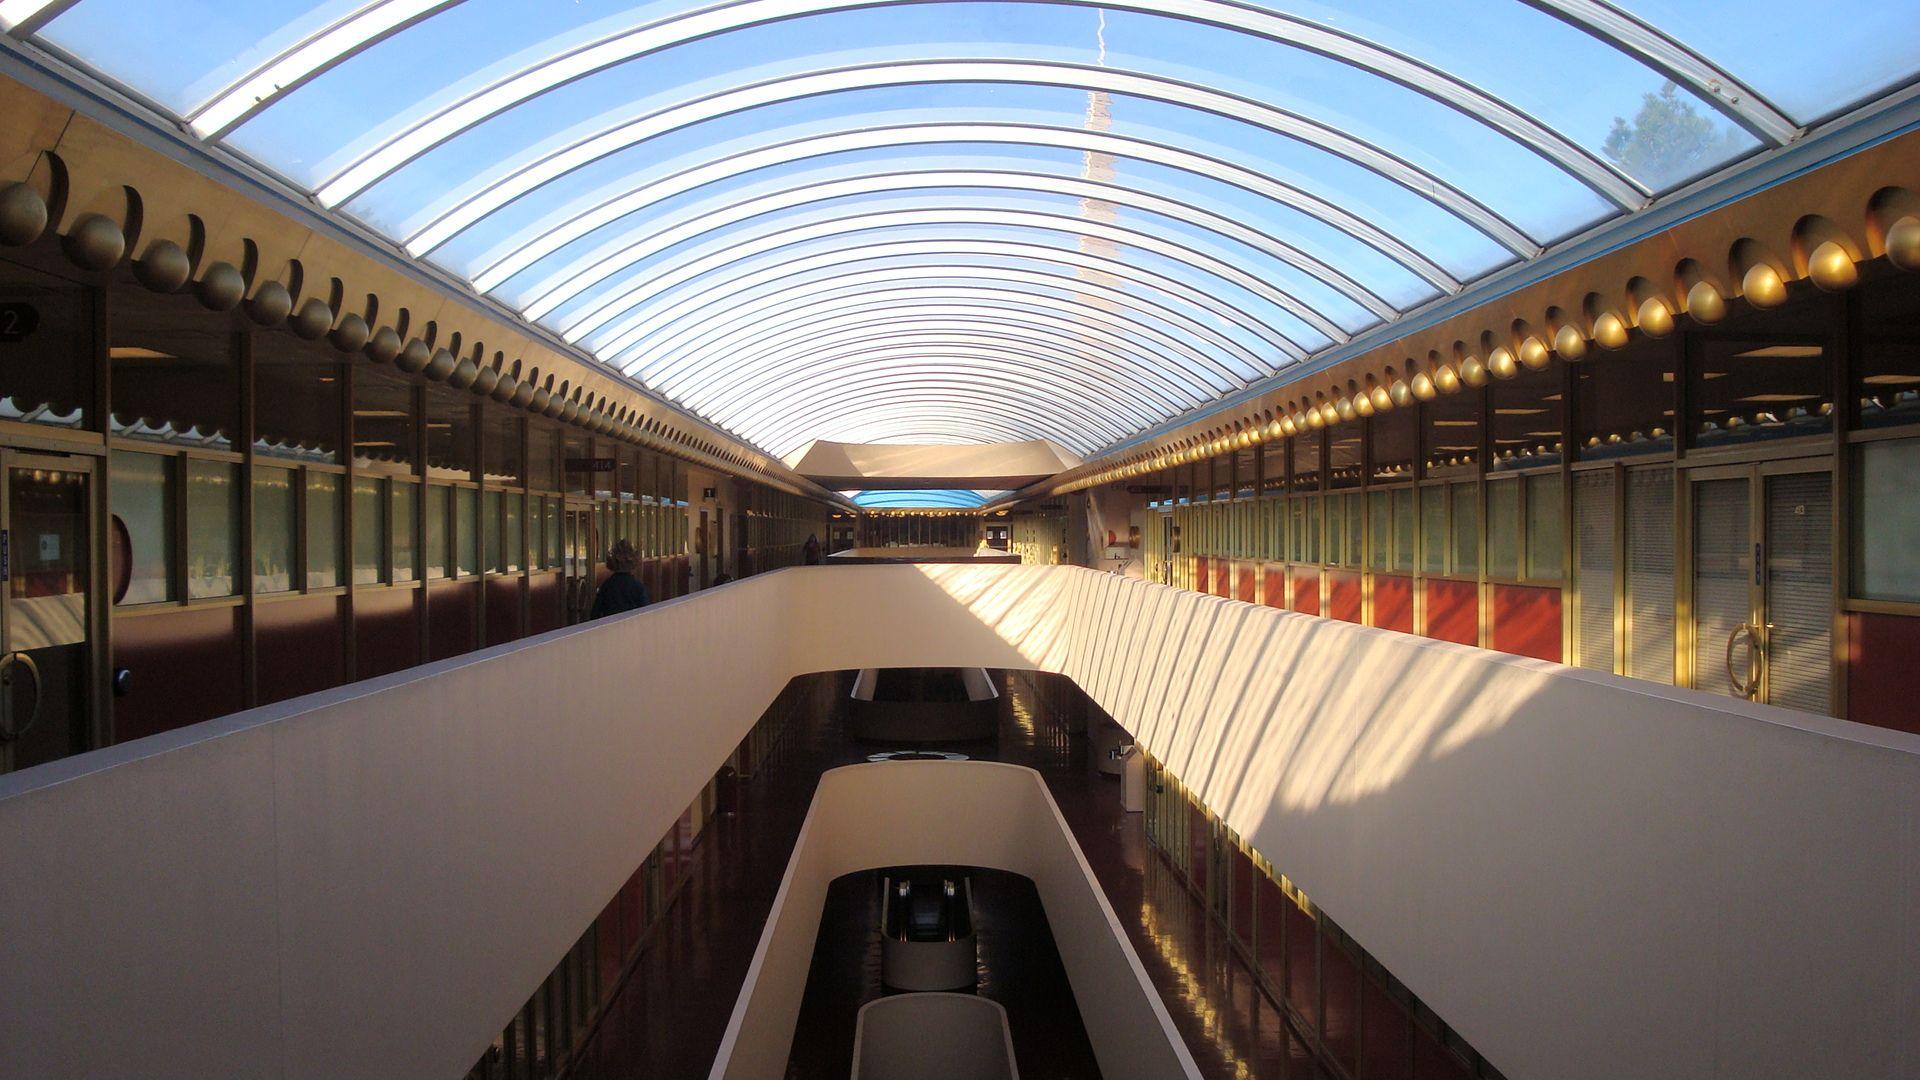 Modern Architecture Encyclopedia marin civic center interior - gattaca - wikipedia, the free